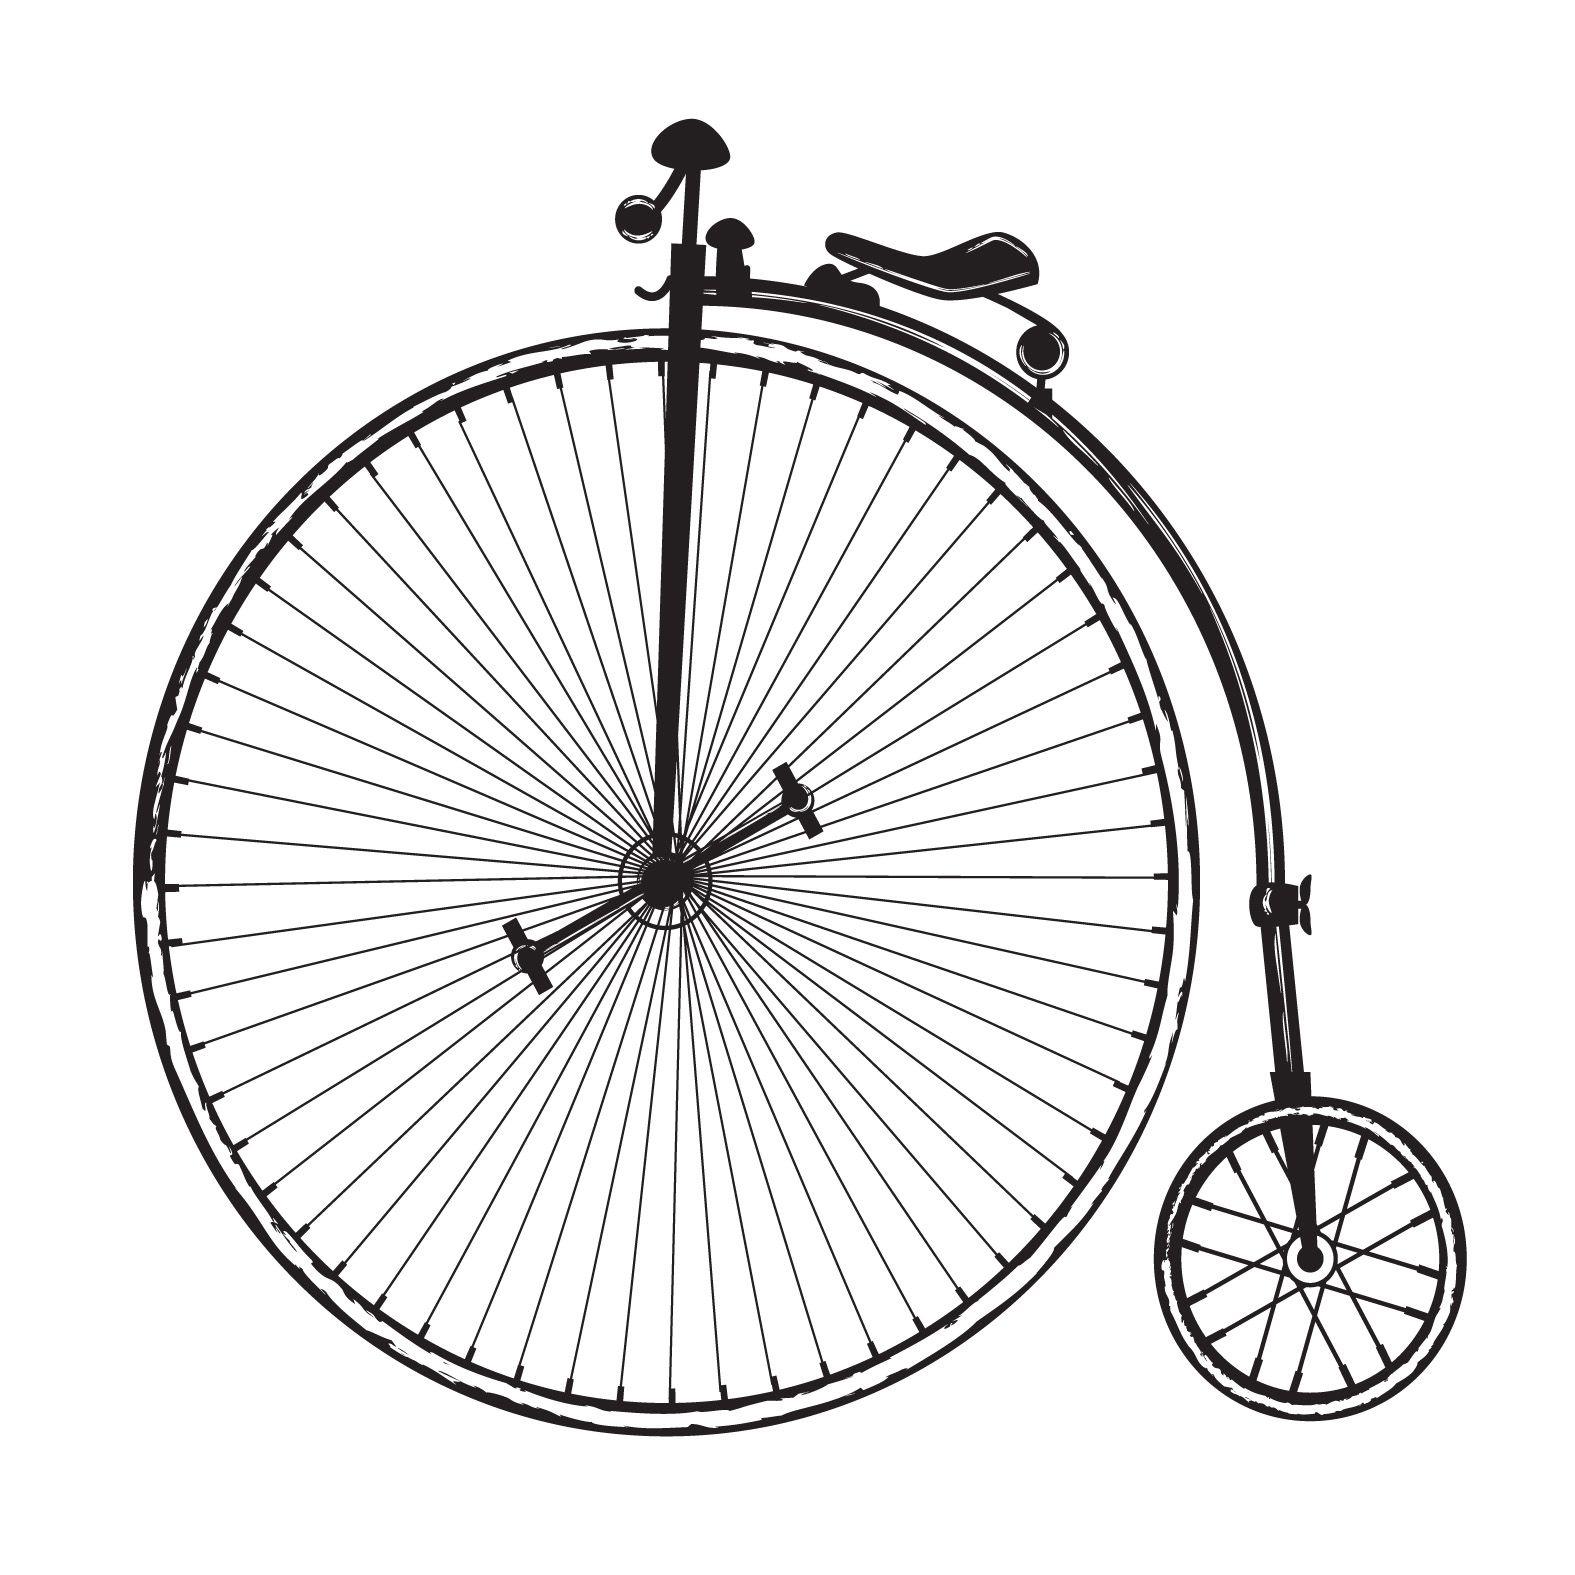 Free vintage bicycle clip art | ⎙ PRINT me for free | Pinterest ...